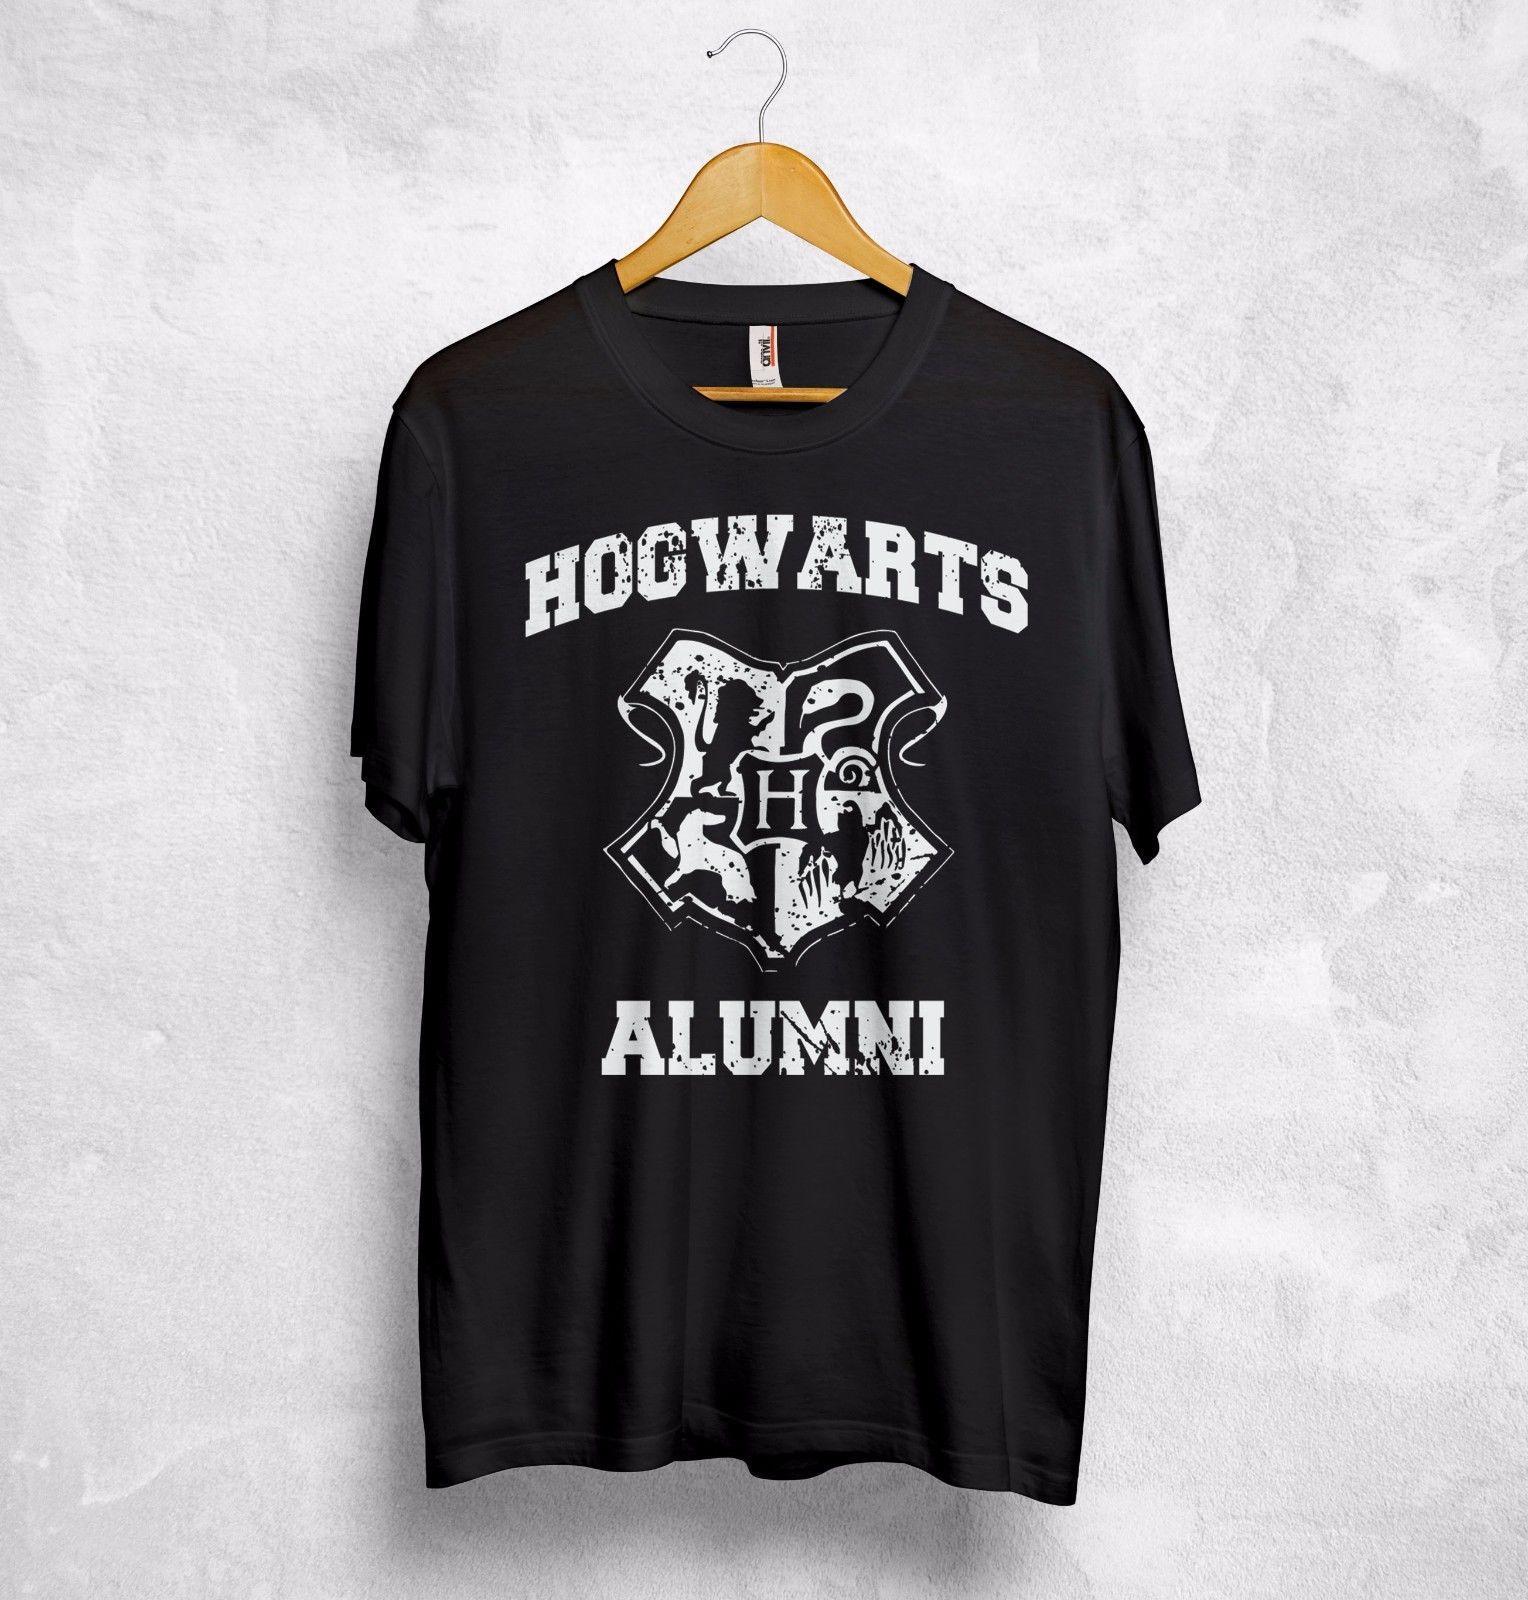 844f22796 Compre Hogwarts Alumni Camiseta Top Harry Potter Película Hermione Ron  Quality School Gift A  15.72 Del Funnytees